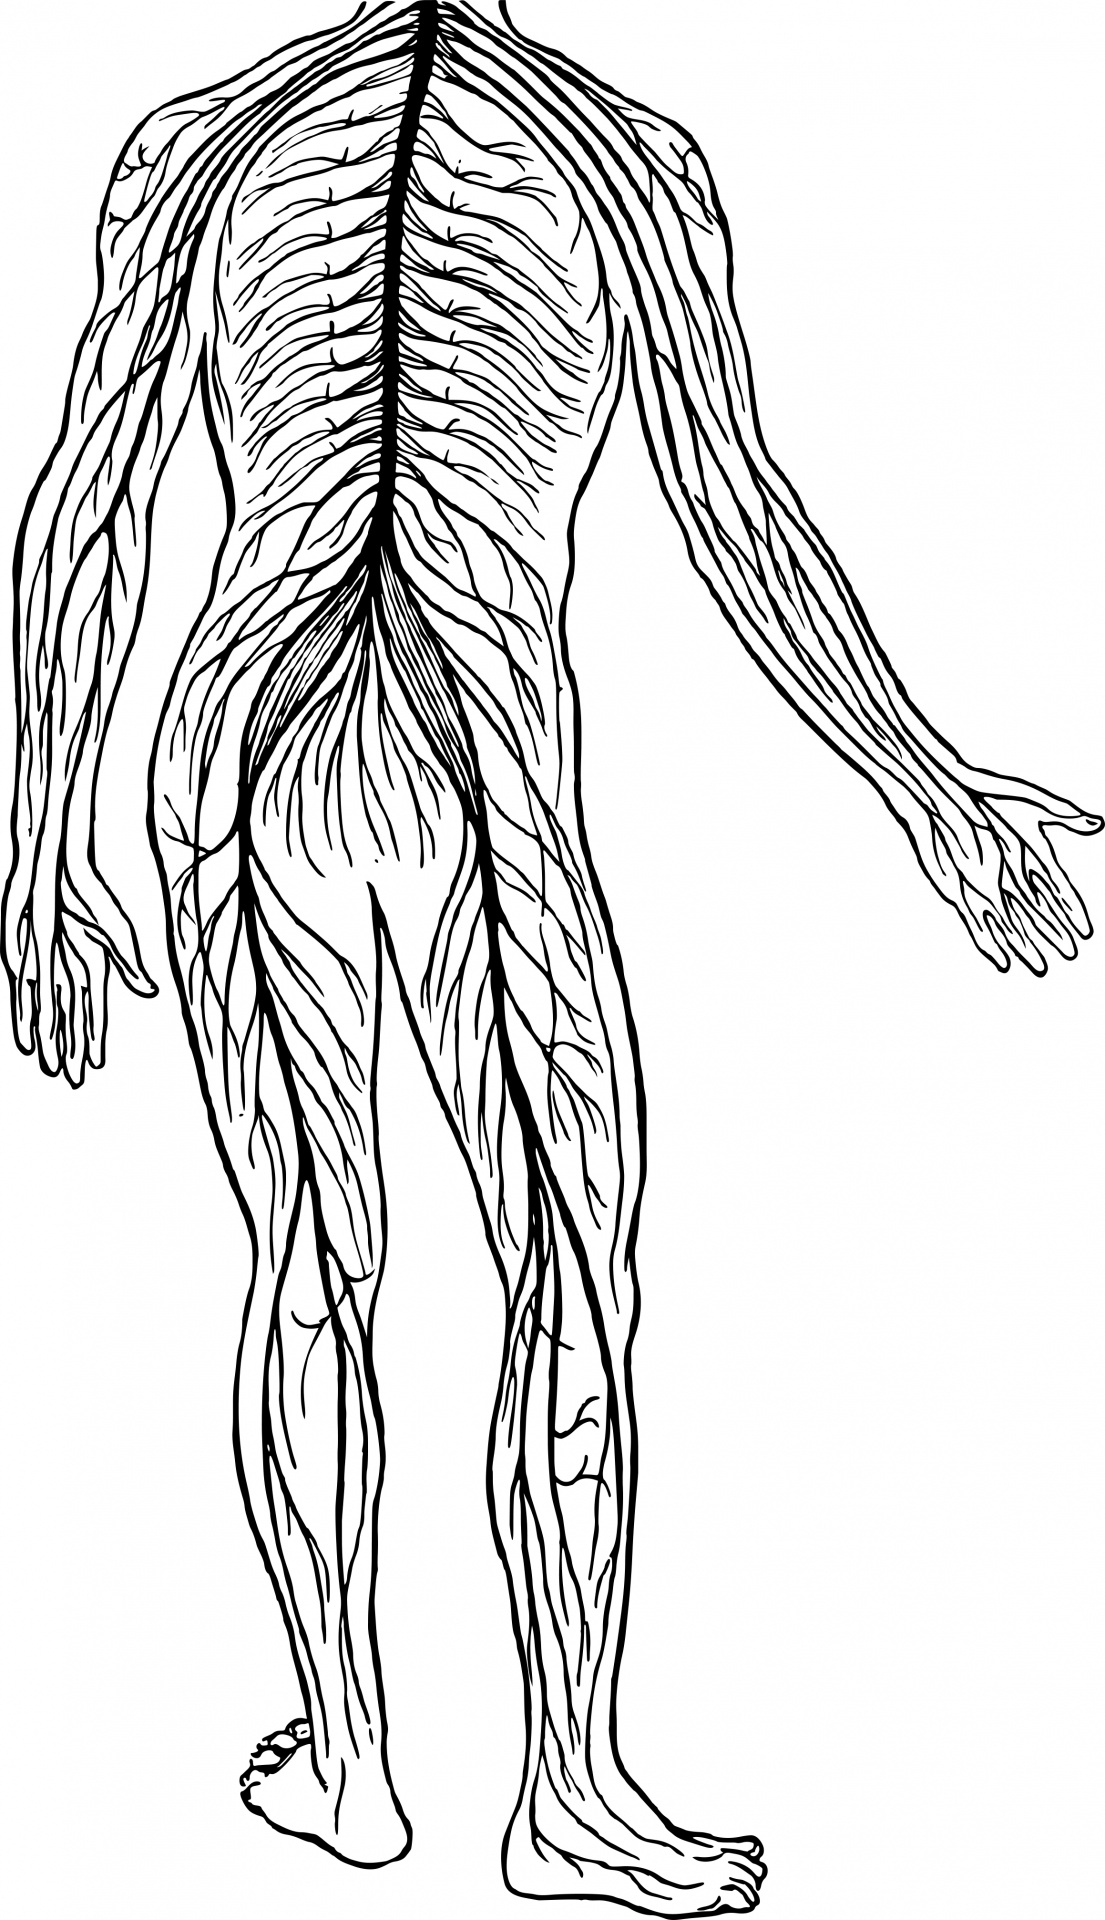 Nervous System Free Stock Photo